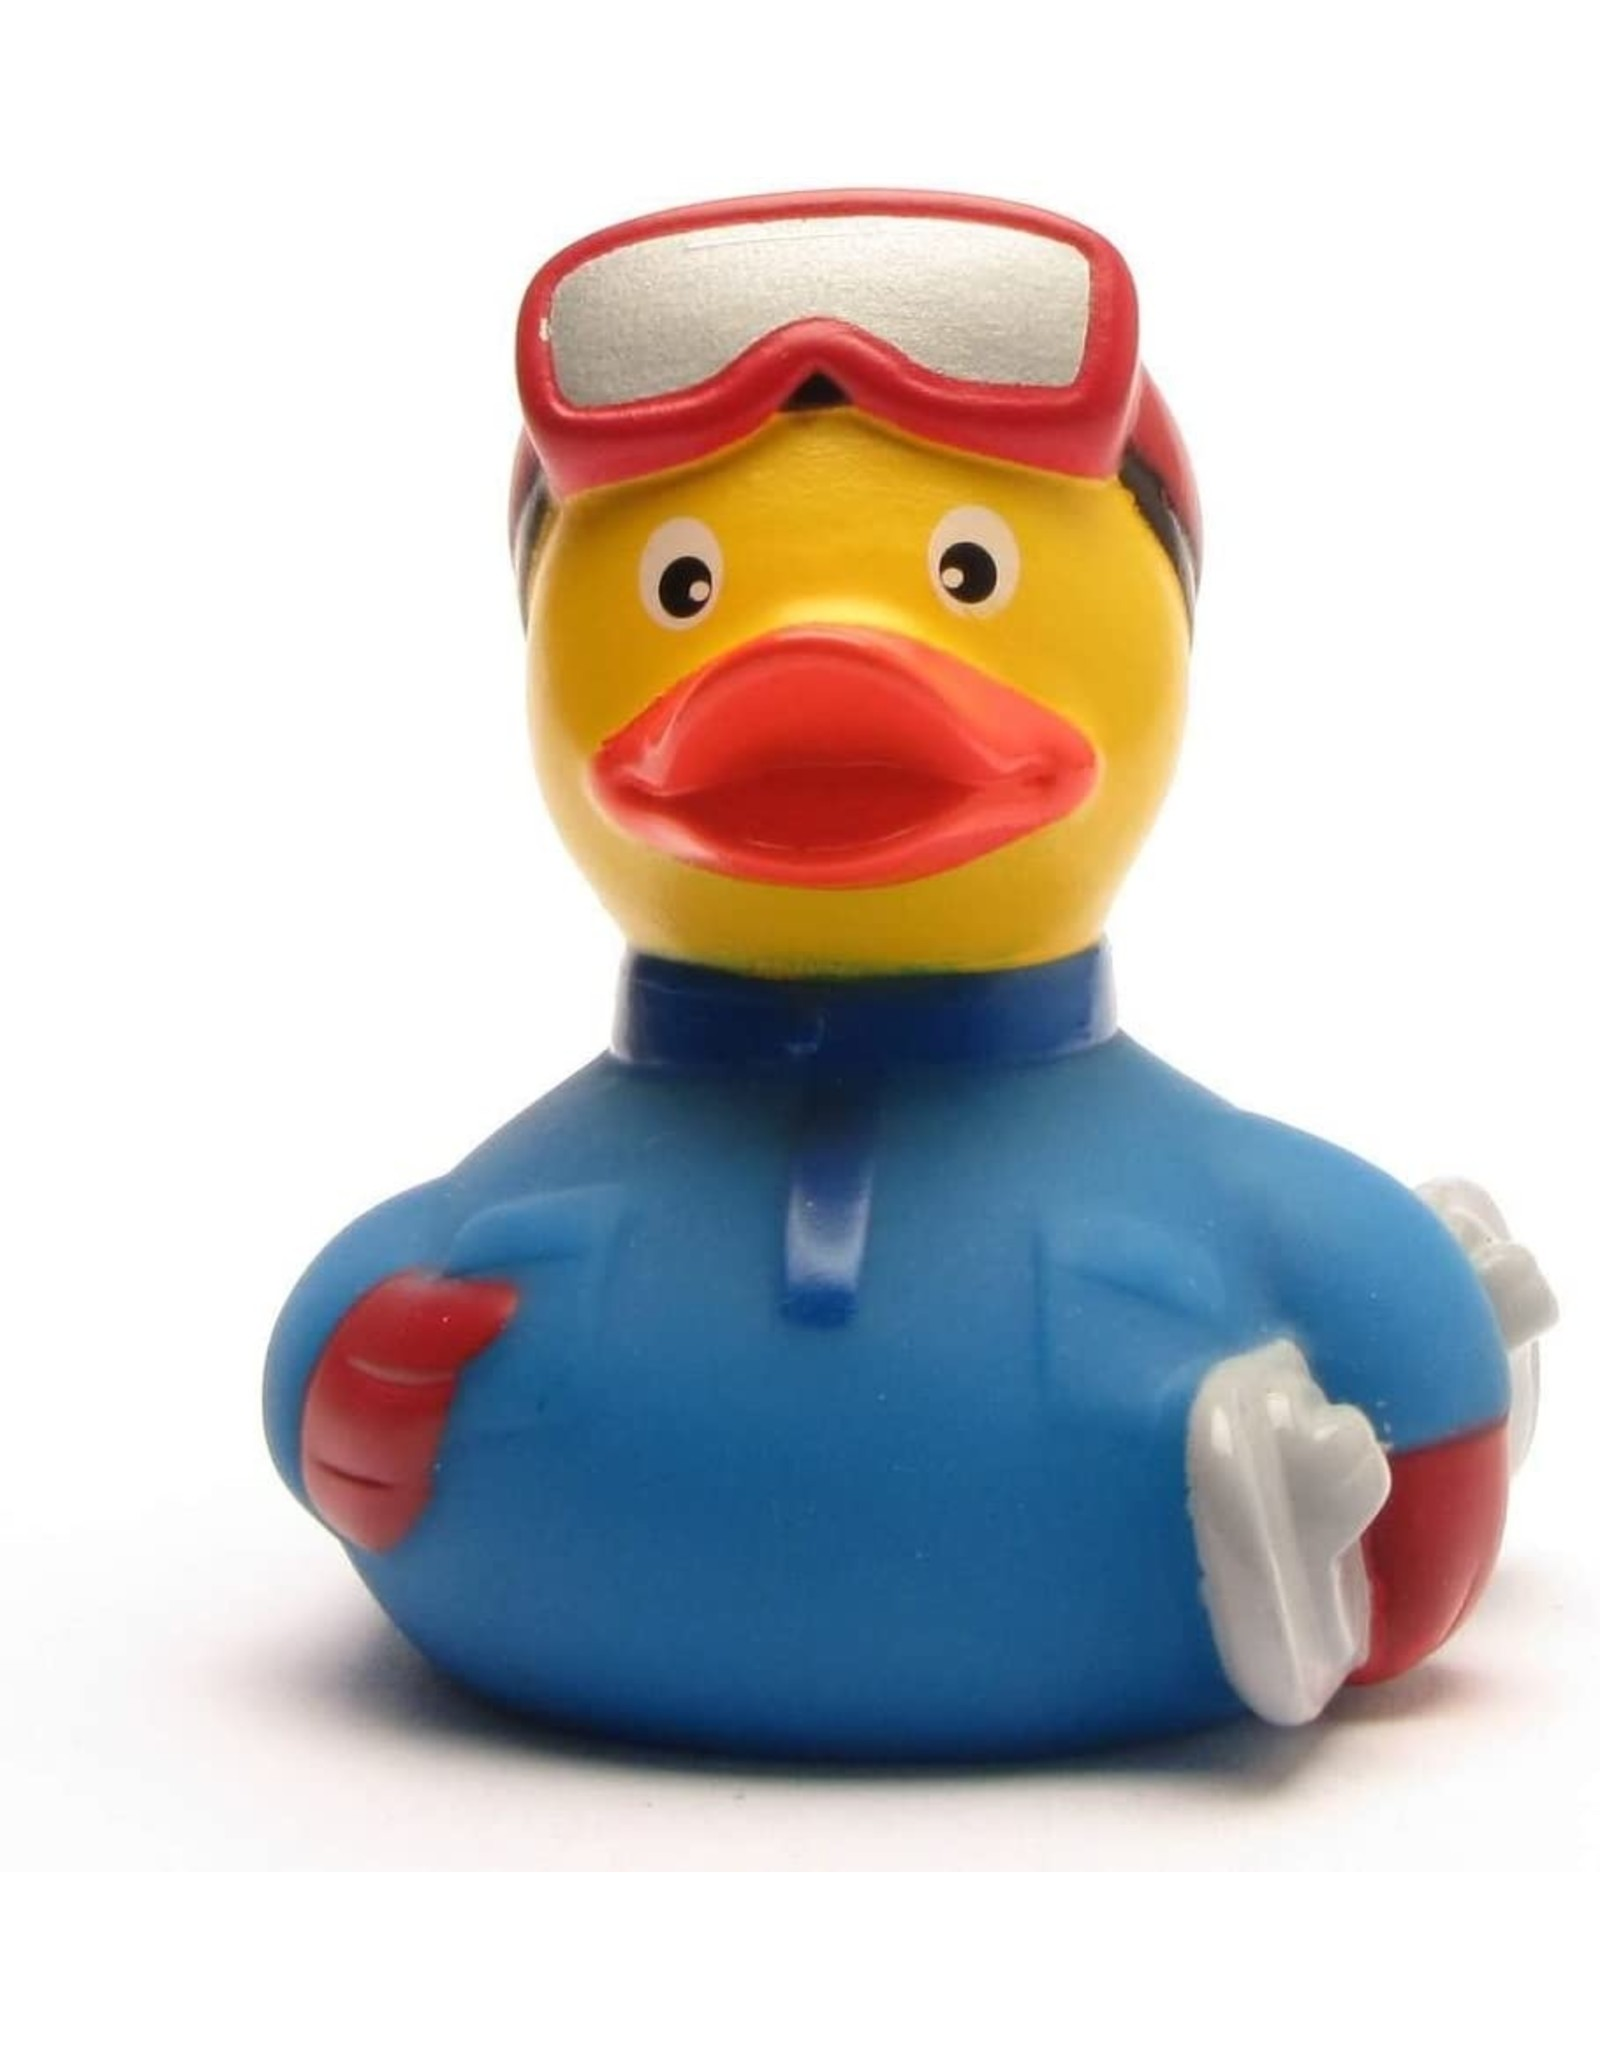 Snowboarder Rubber Duck